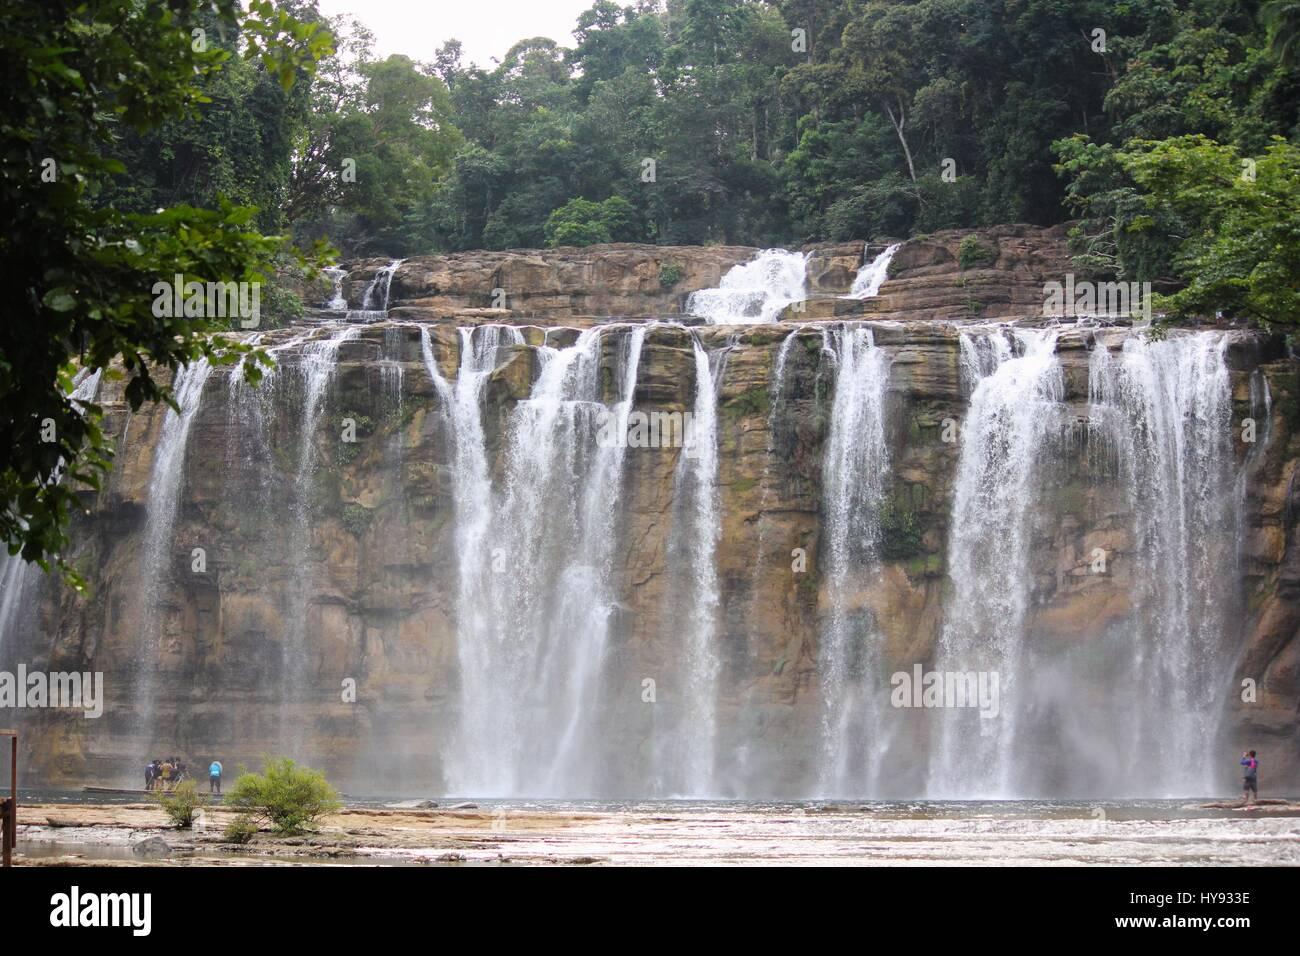 Tinuy-an Falls, Bislig, Surigao del Sur Philippines - Stock Image